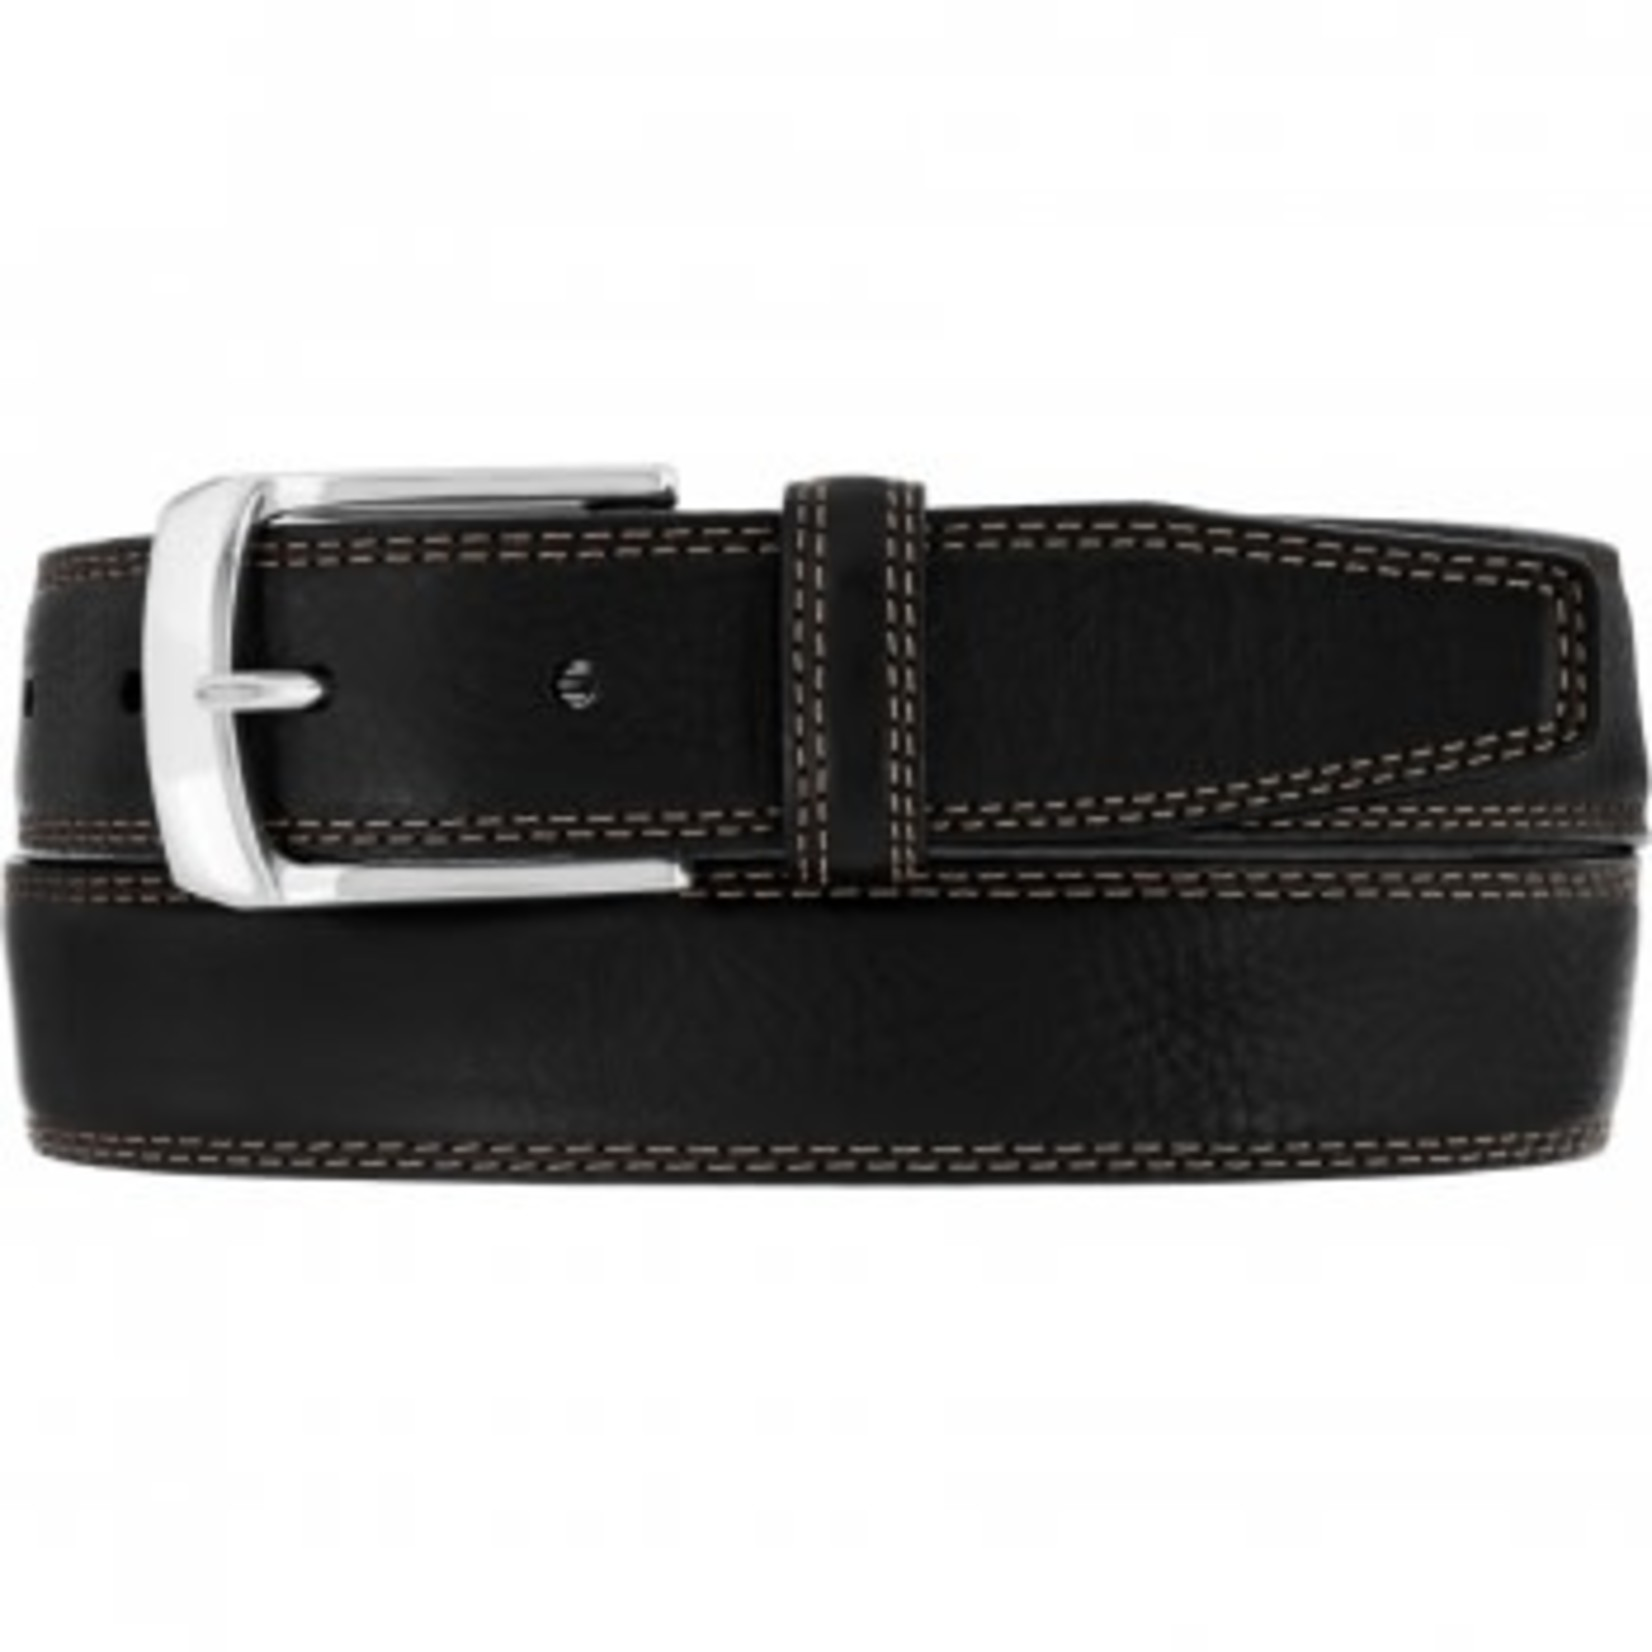 Brighton Ventura Belt in Black 36